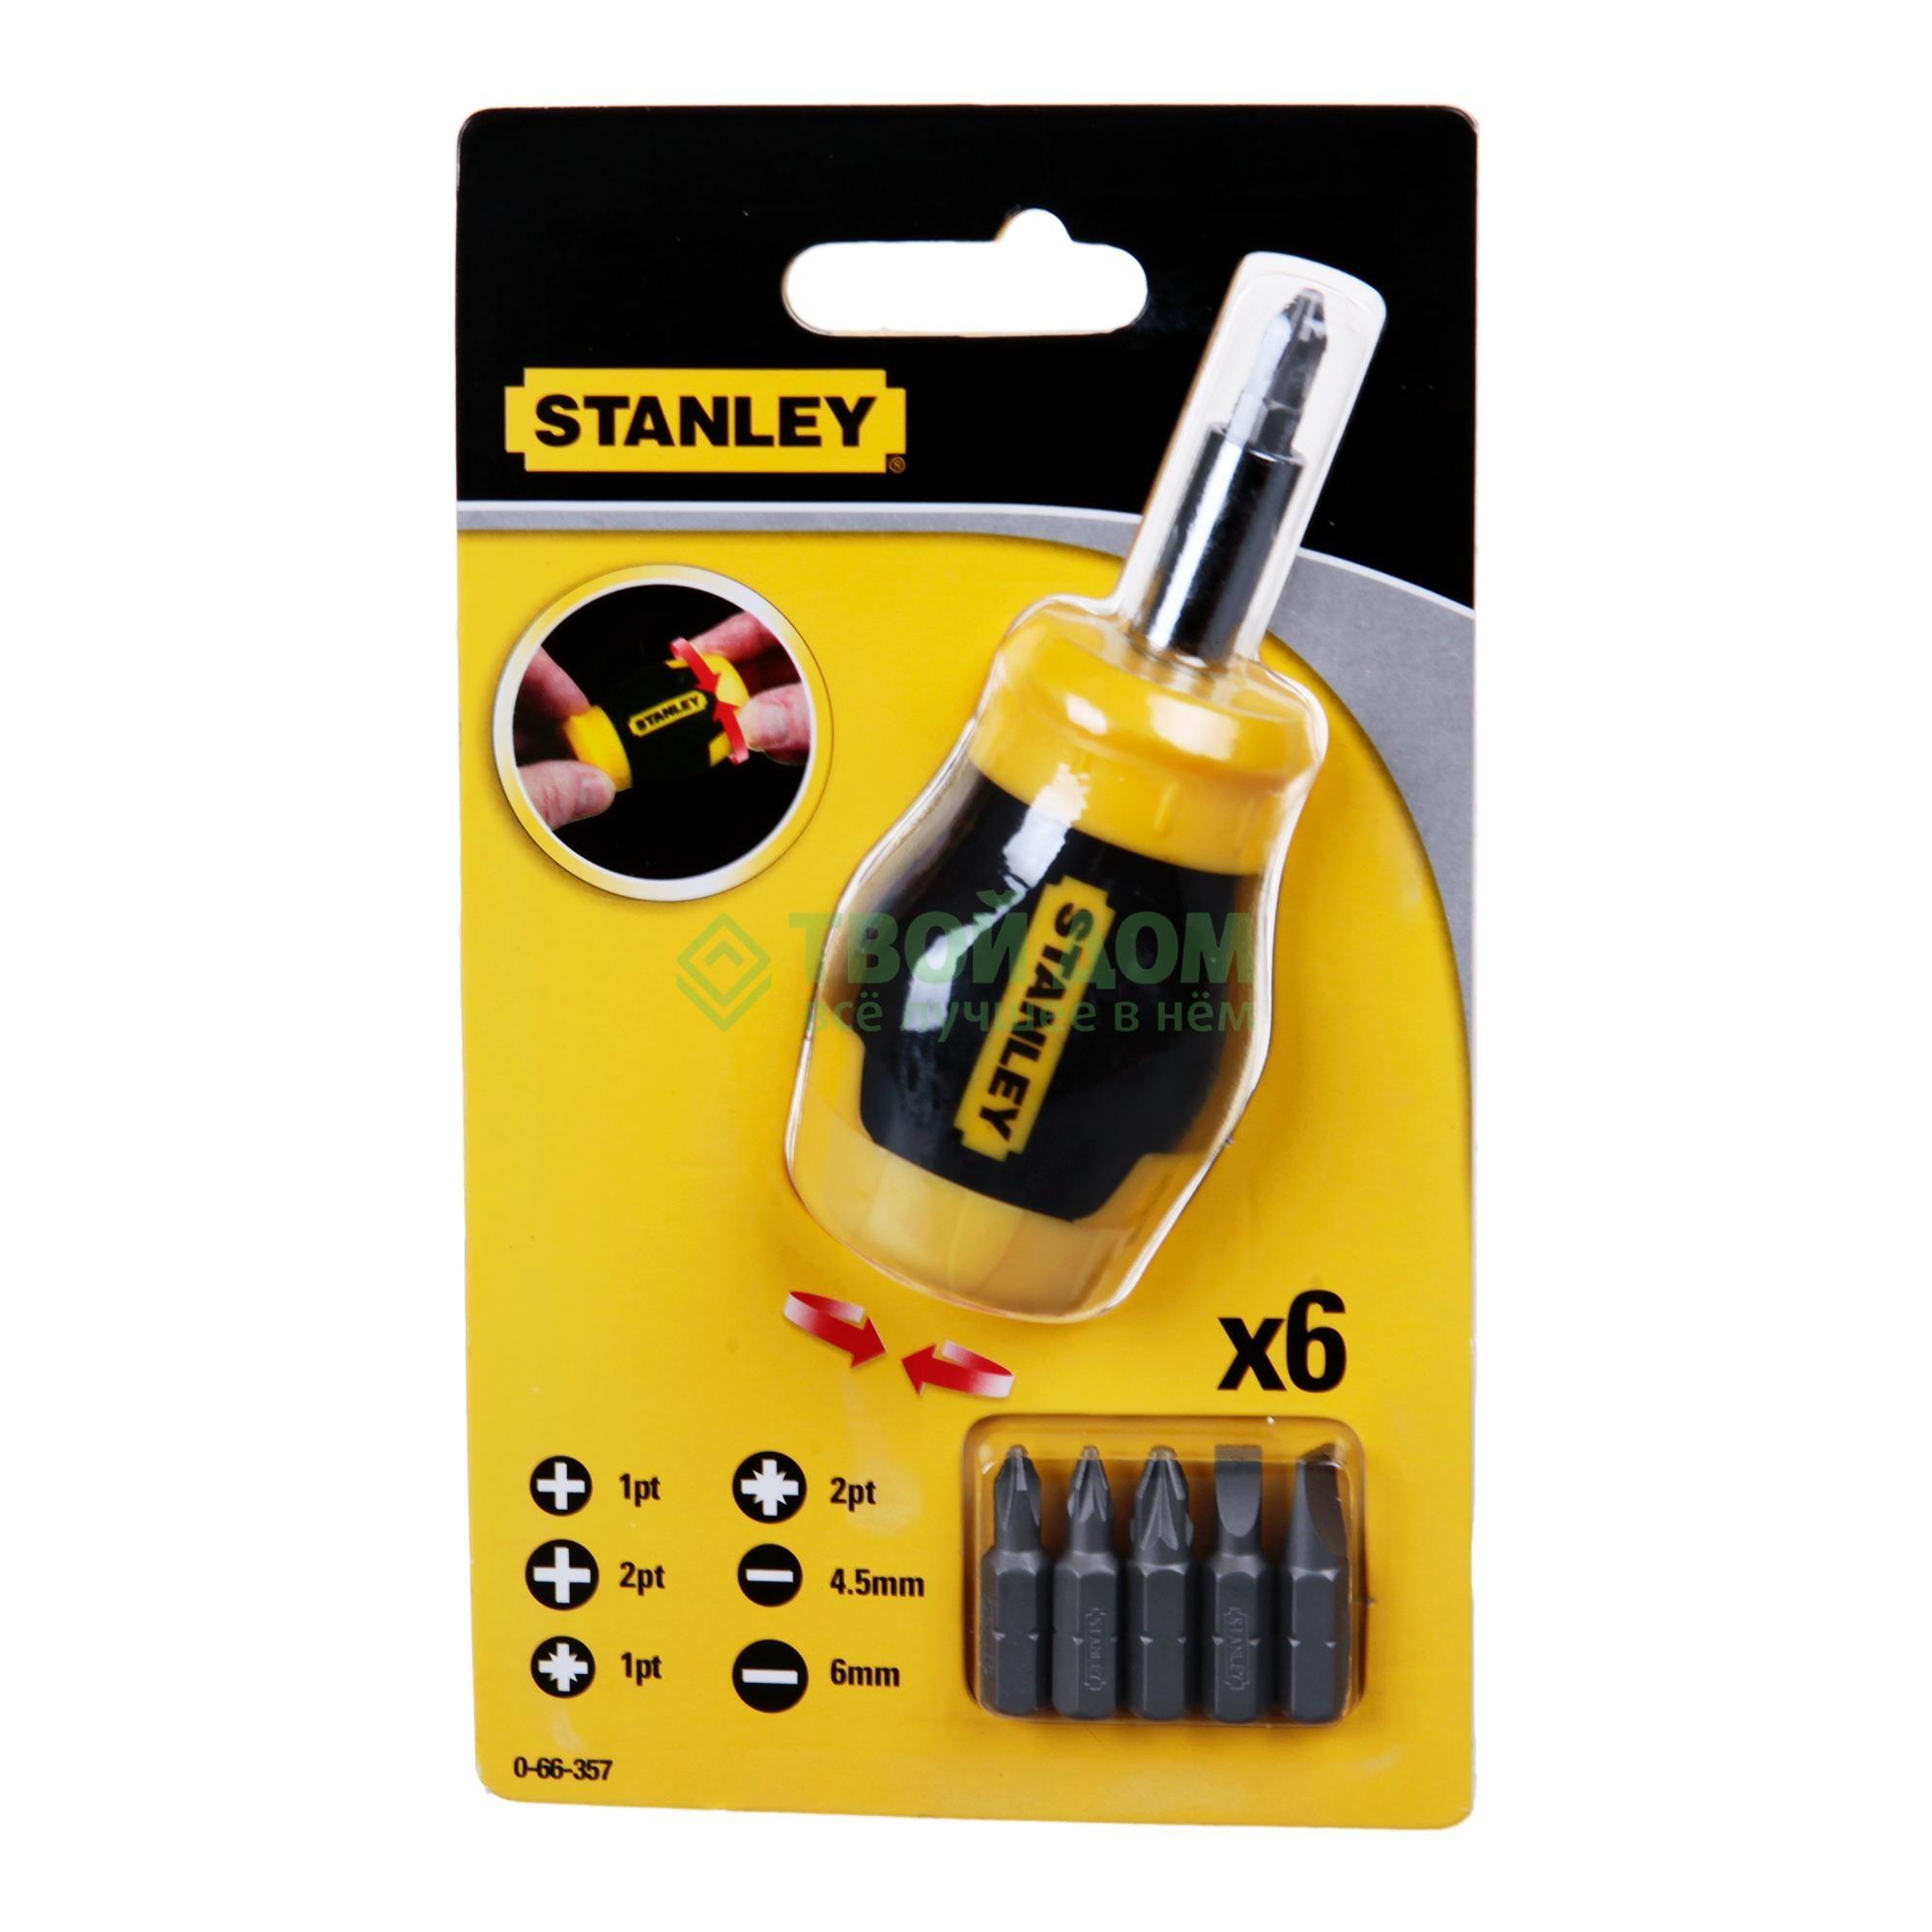 Отвертка с битами Stanley (0-66-357)